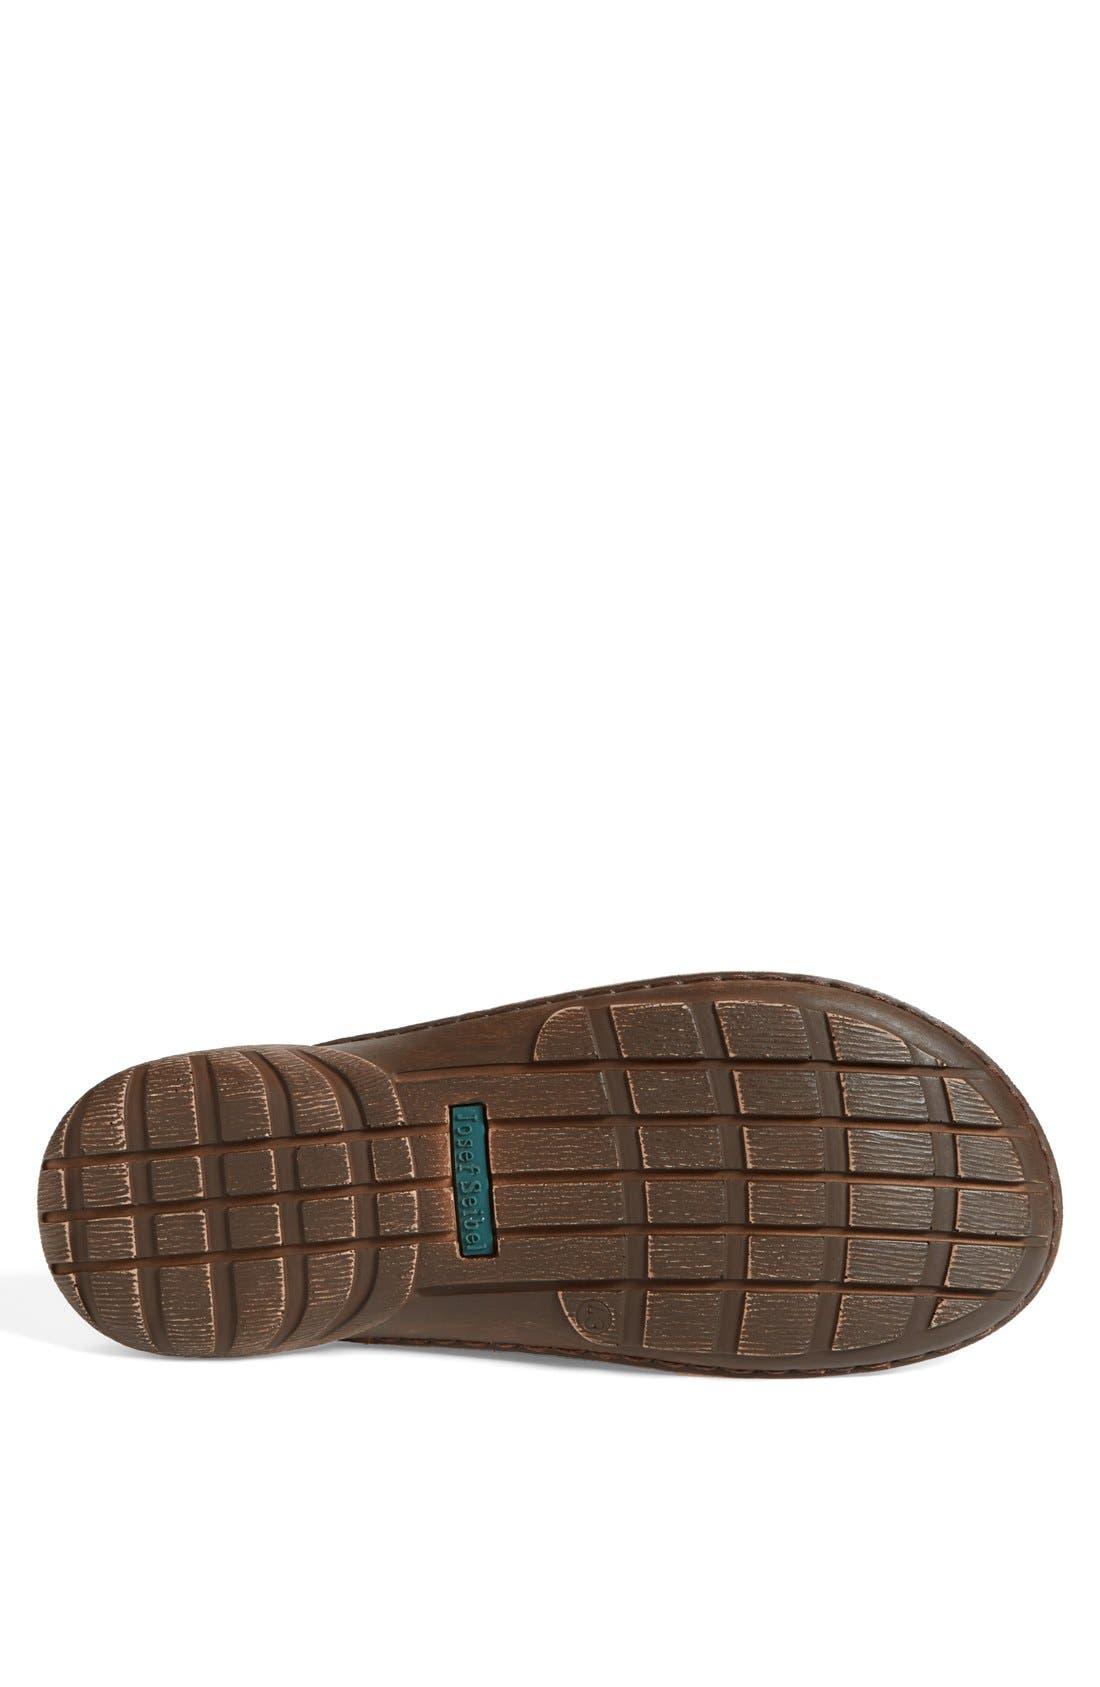 'Logan 21' Slide Sandal,                             Alternate thumbnail 4, color,                             Nut